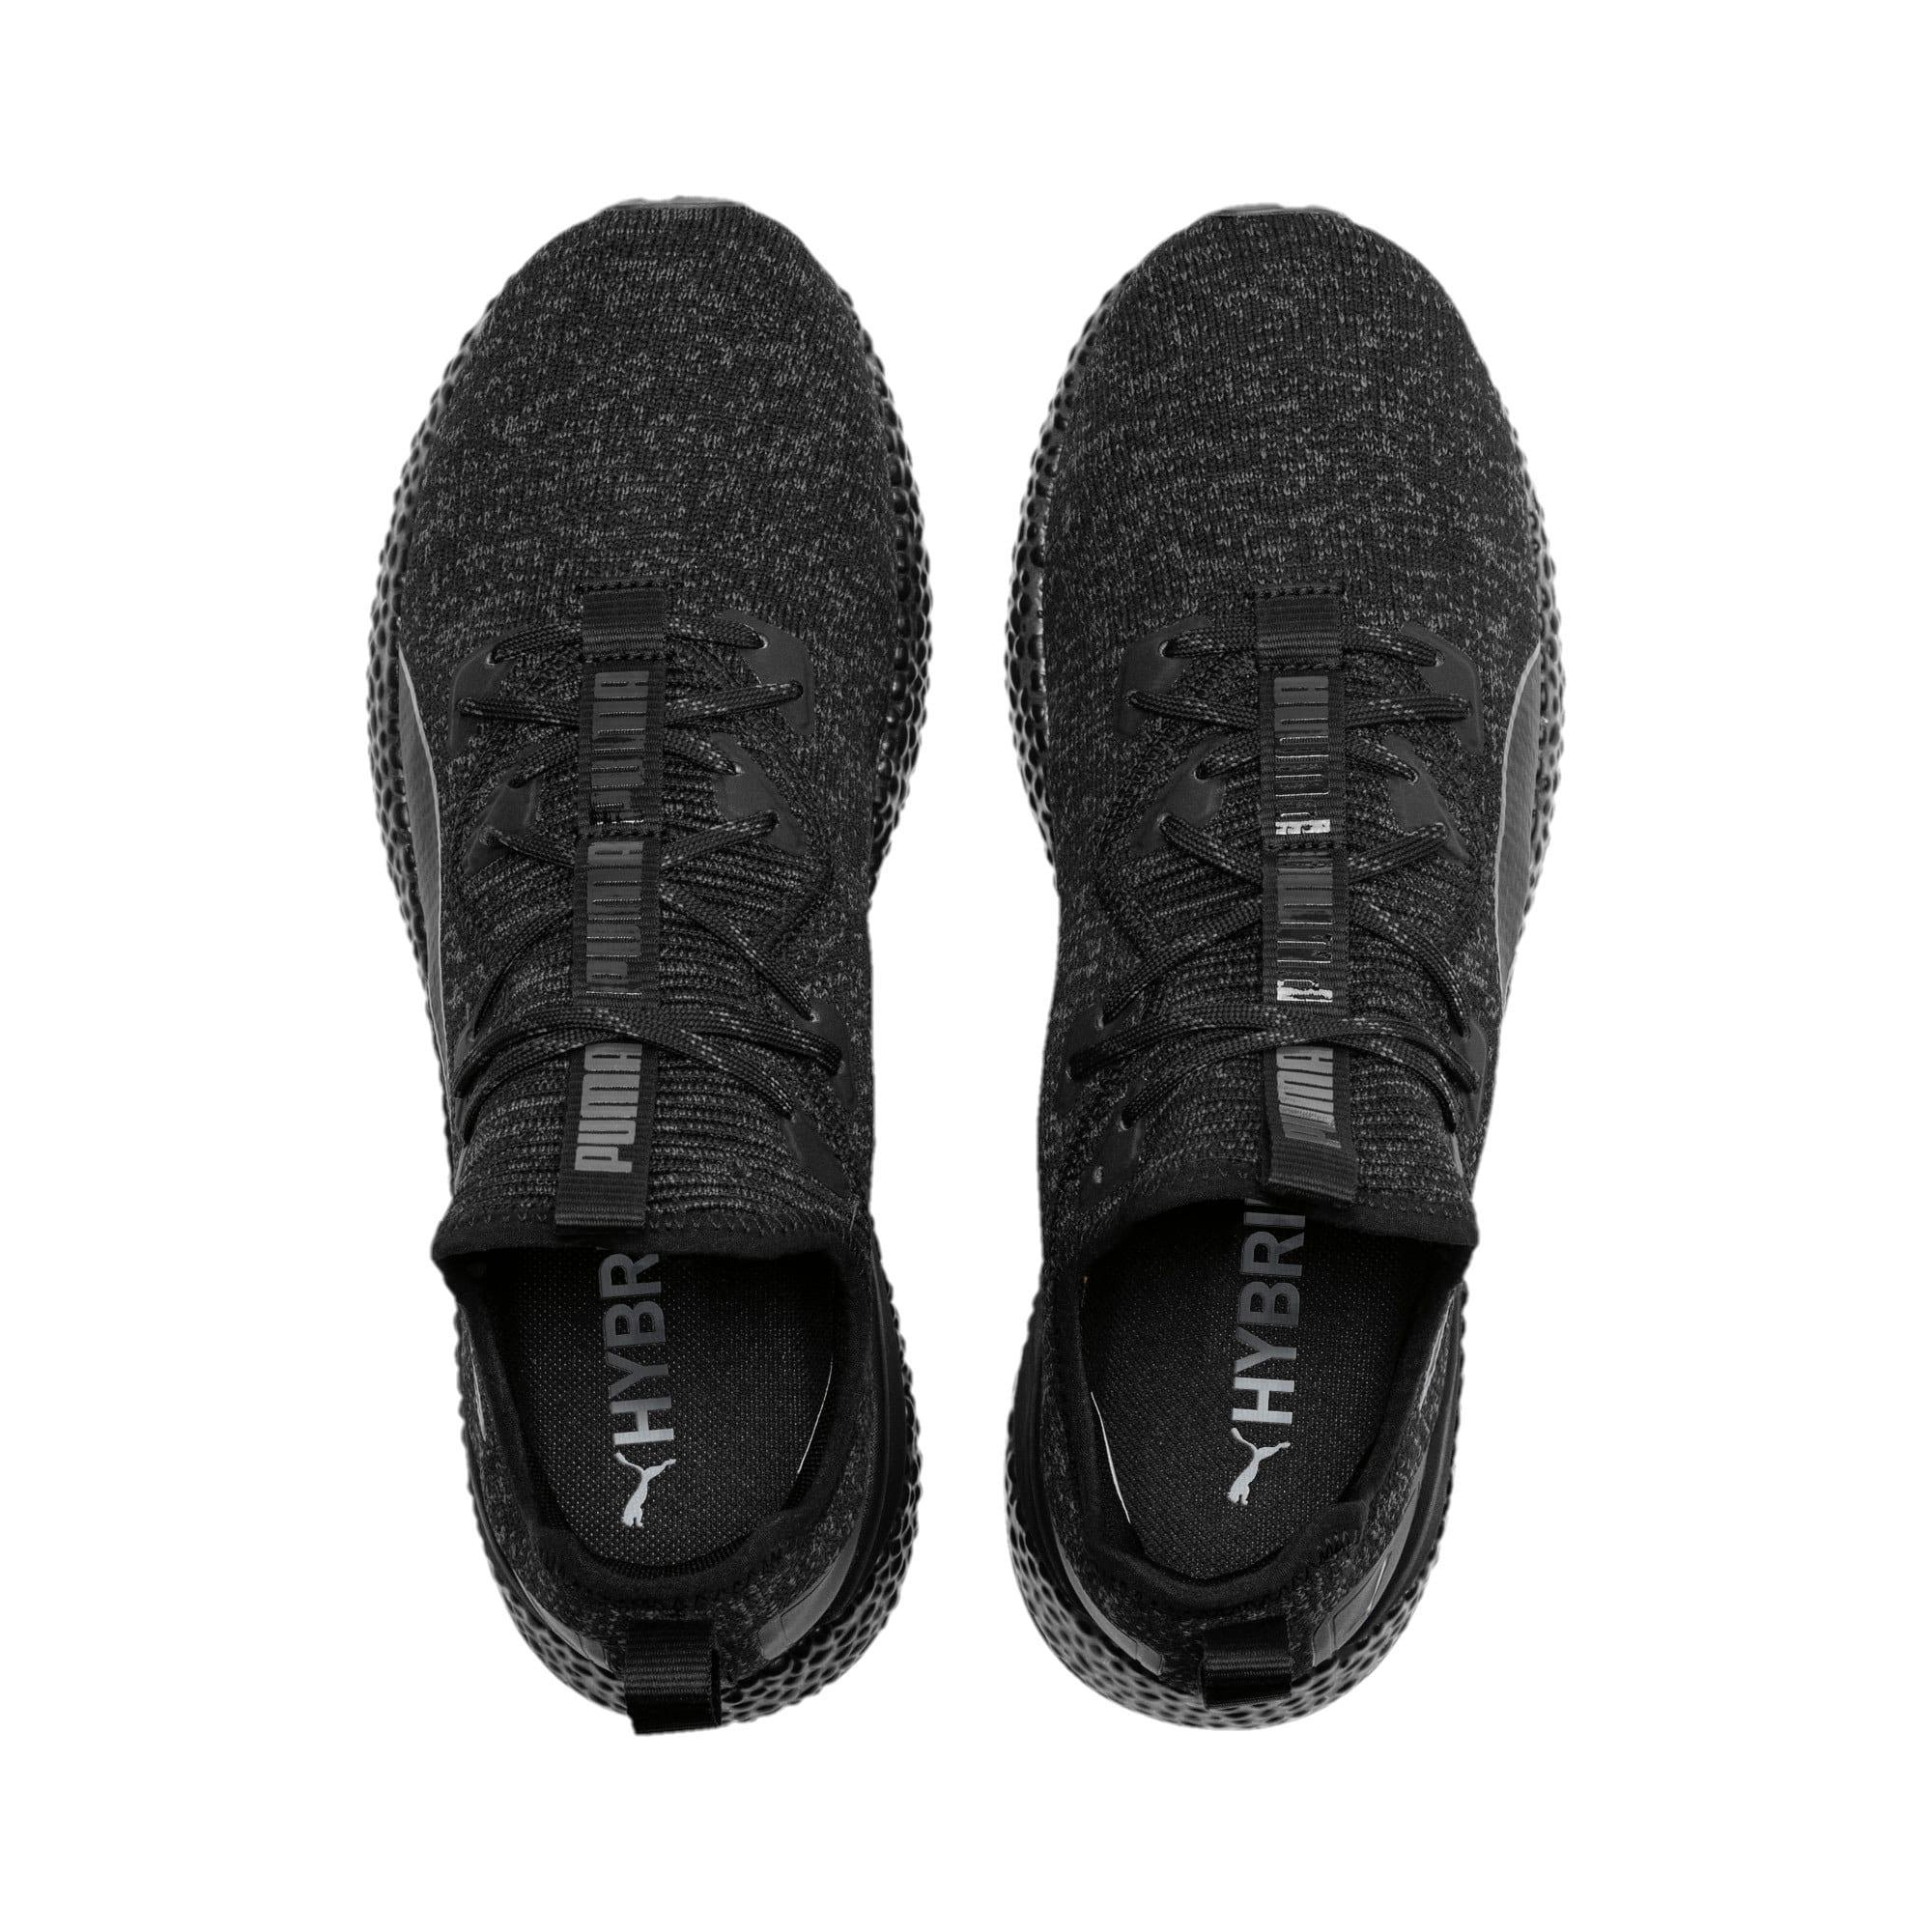 Thumbnail 7 of Hybrid Runner hardloopschoenen voor heren, Asphalt-Puma Black, medium